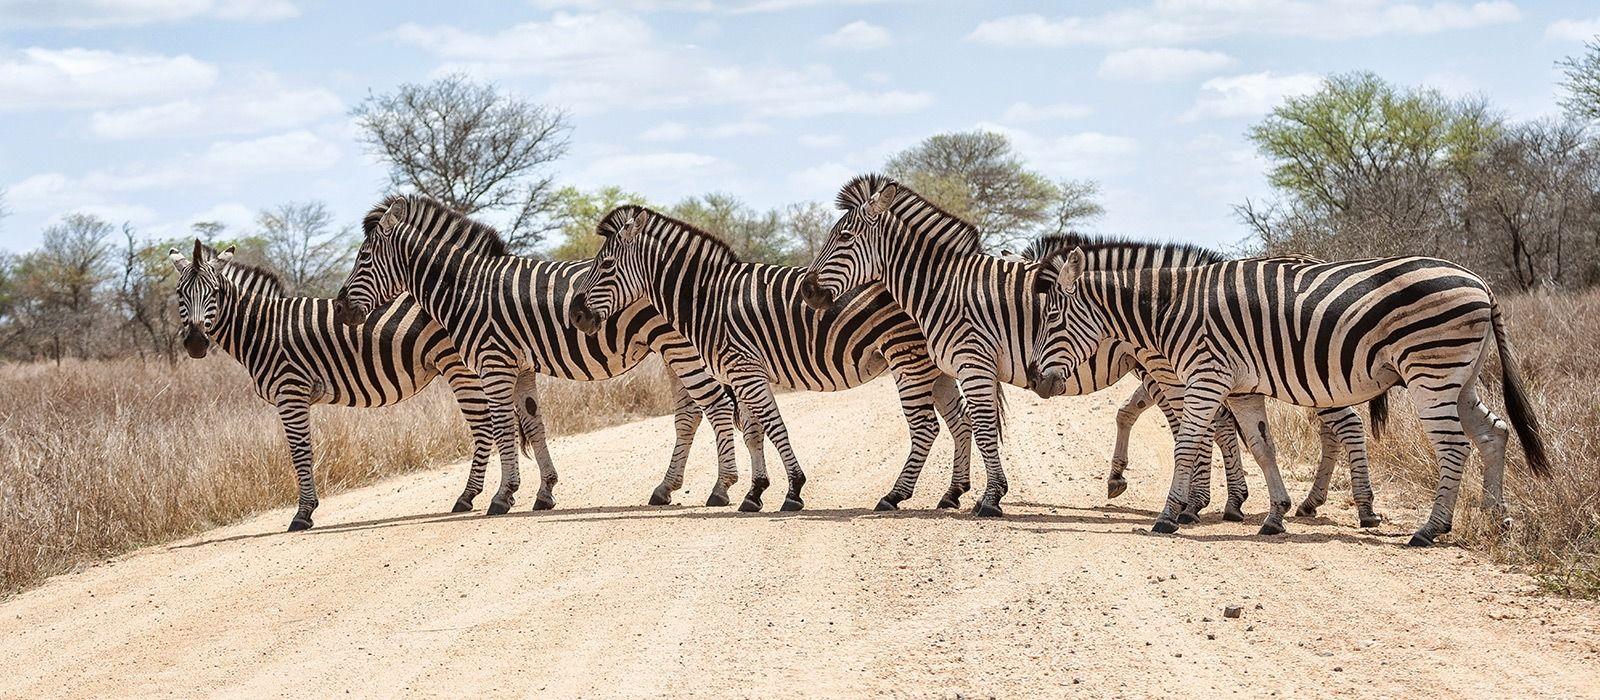 Große Südafrika Rundreise – Johannesburg nach Kapstadt Urlaub 2